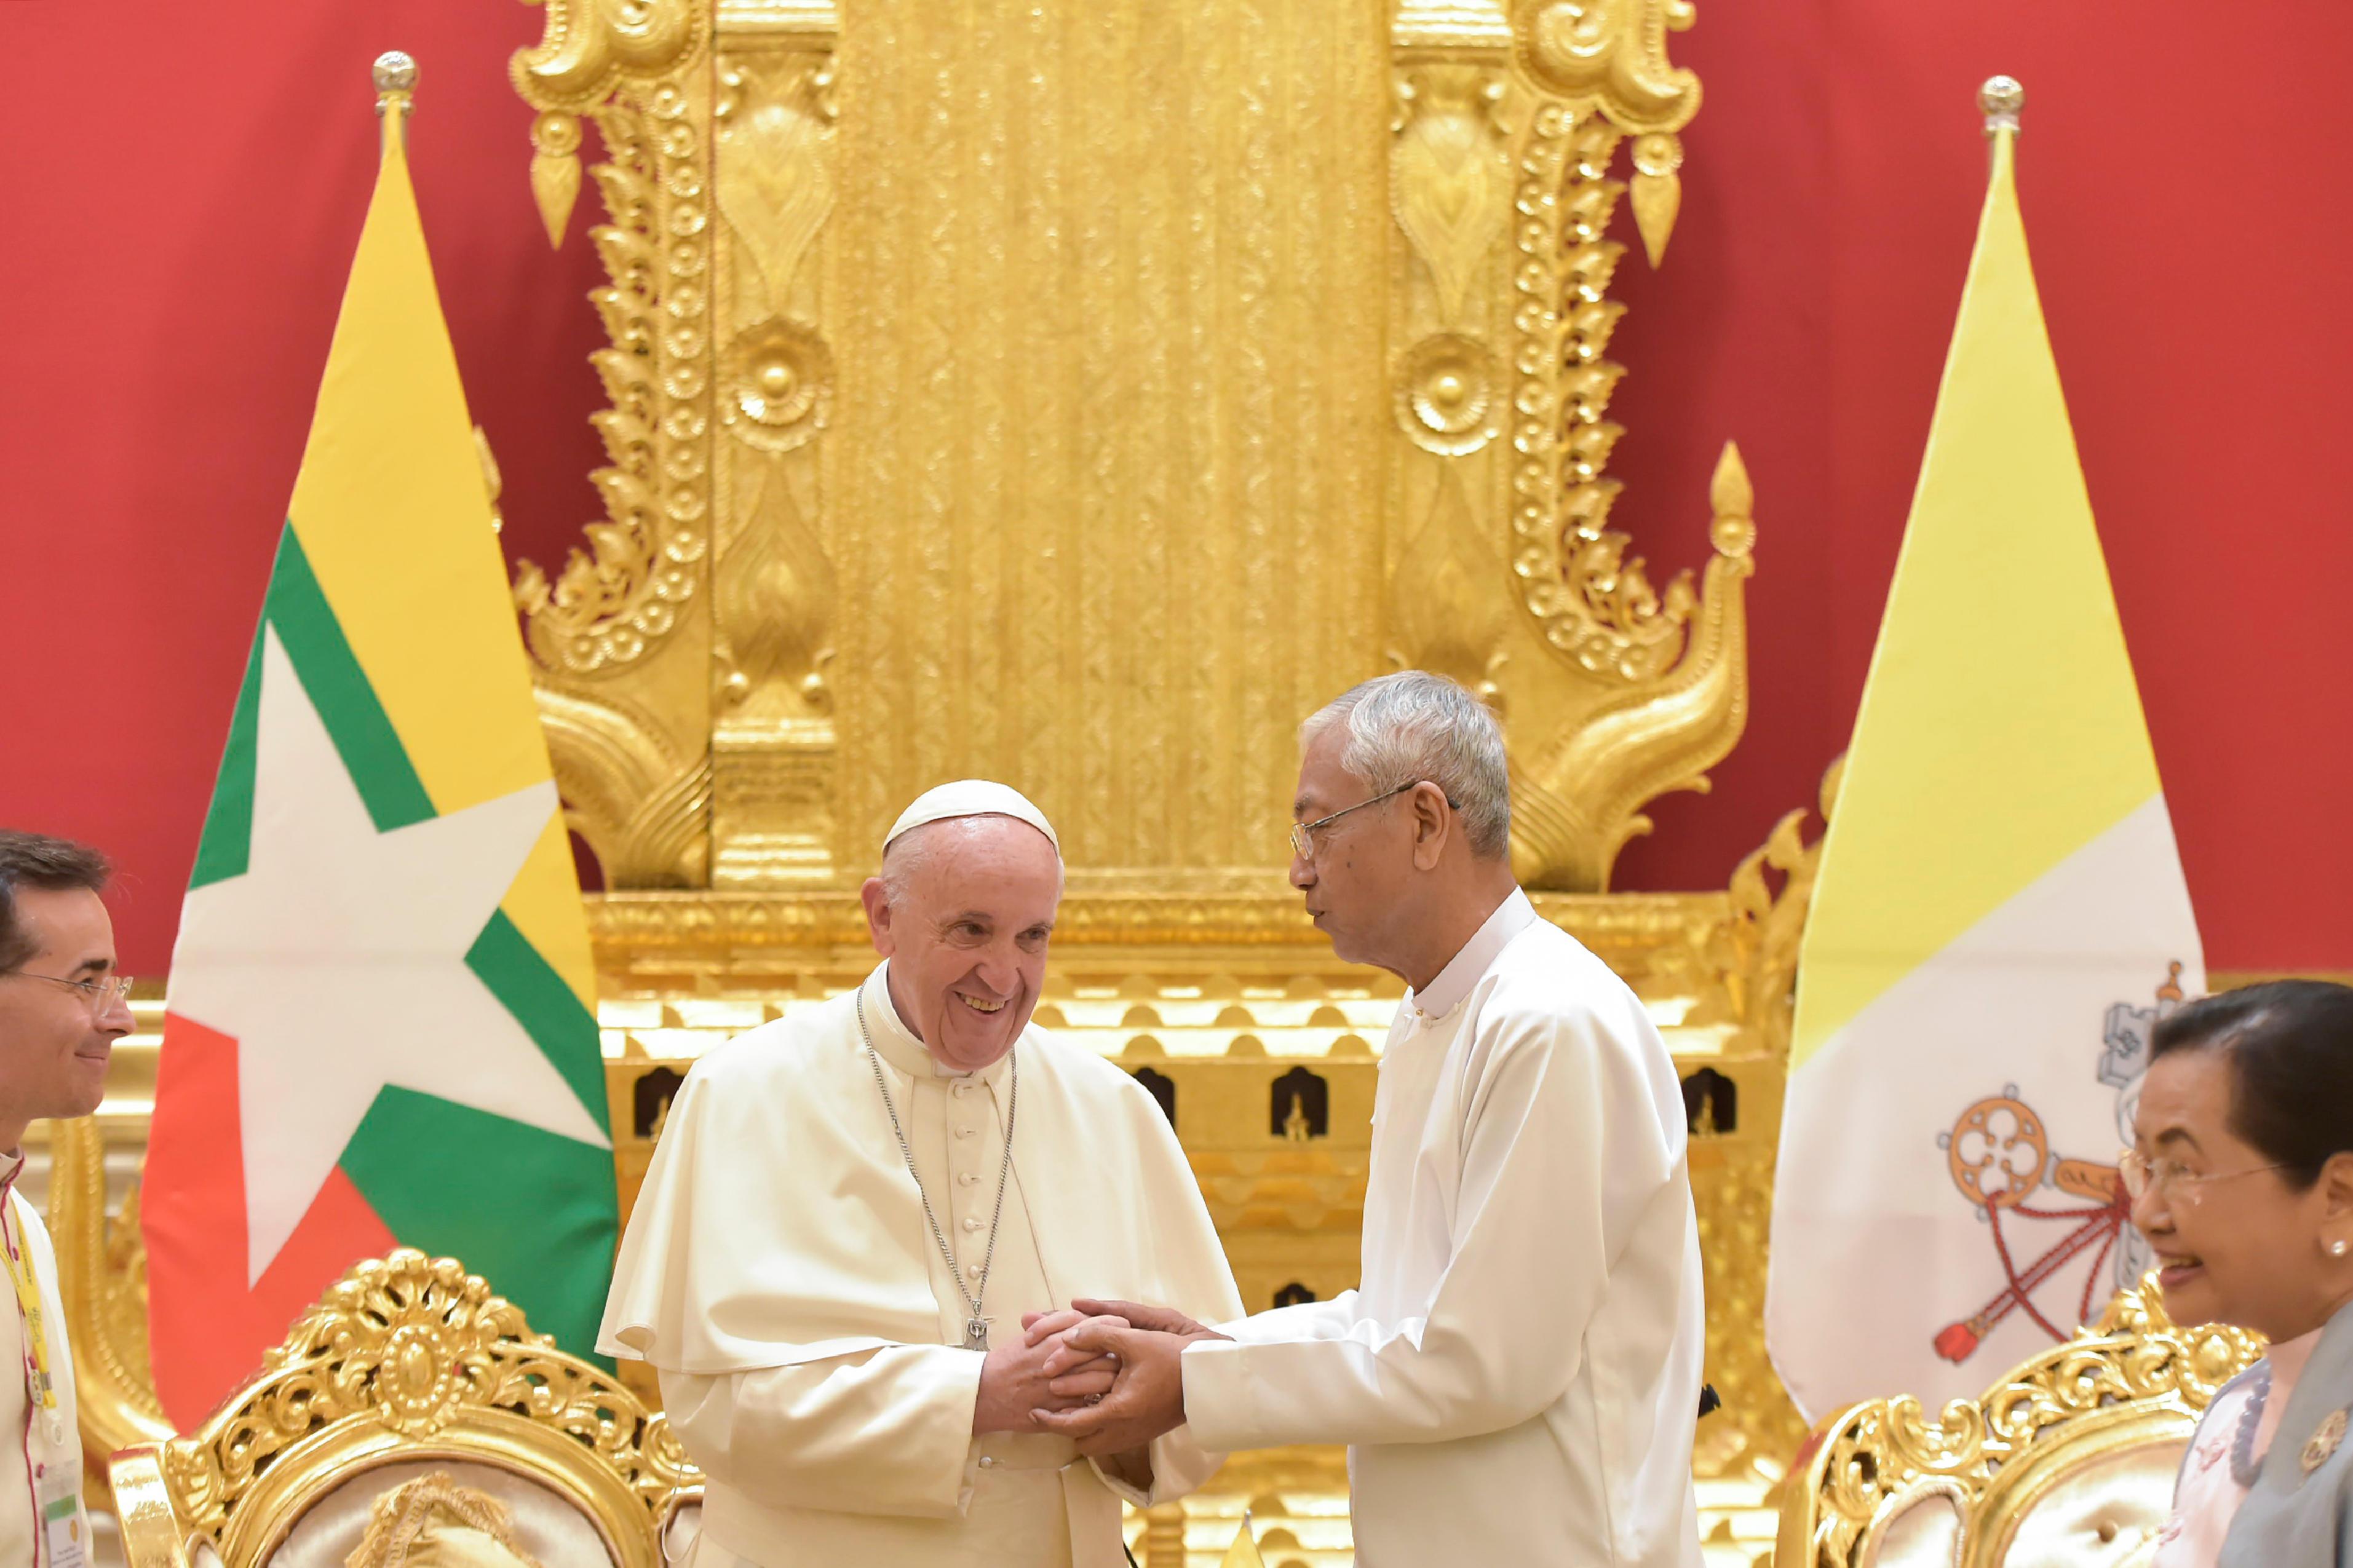 Visita de cortesía al Presidente Htin Kyaw © L'Osservatore Romano